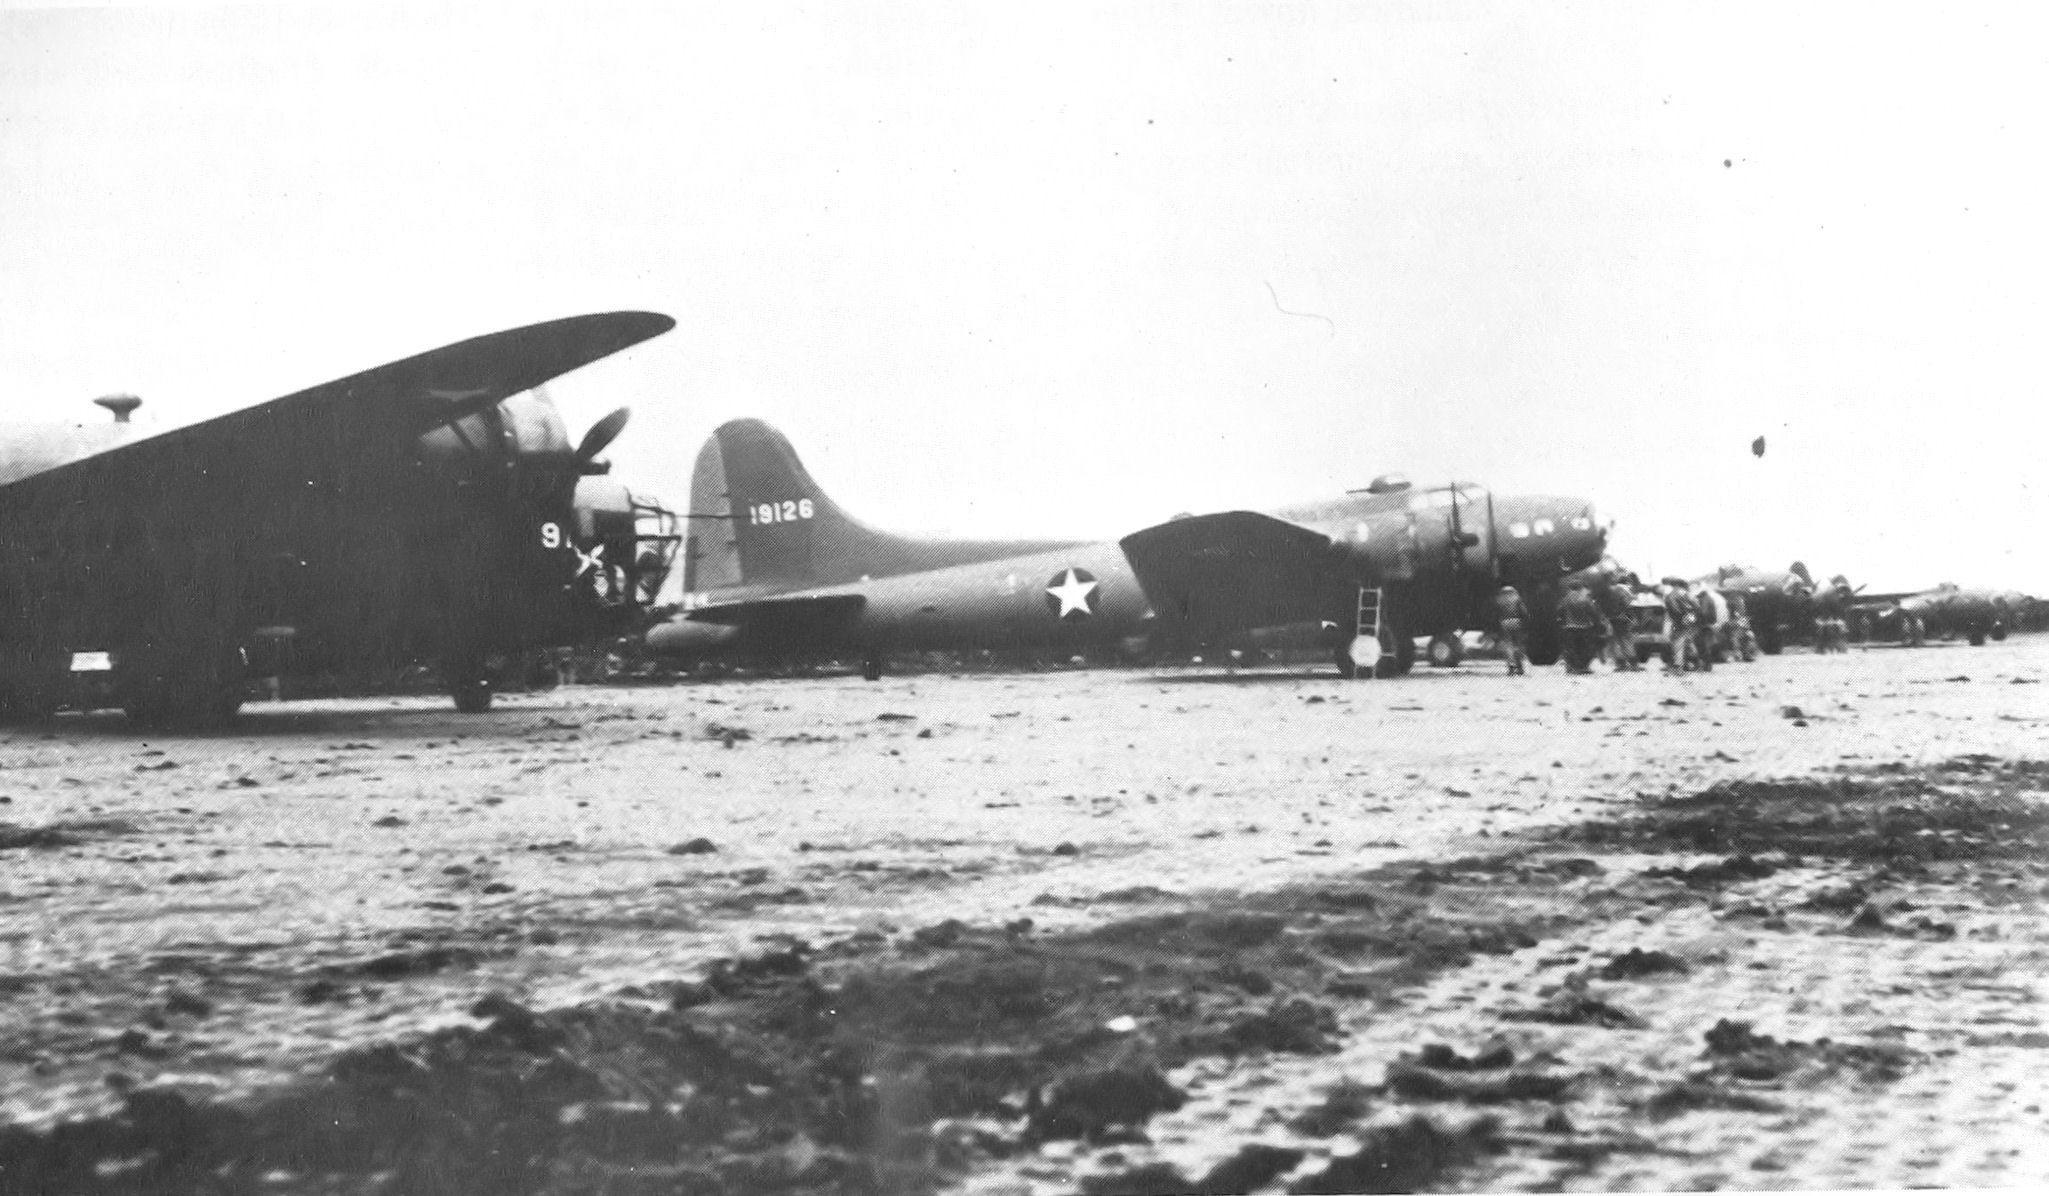 B-17 #41-9126